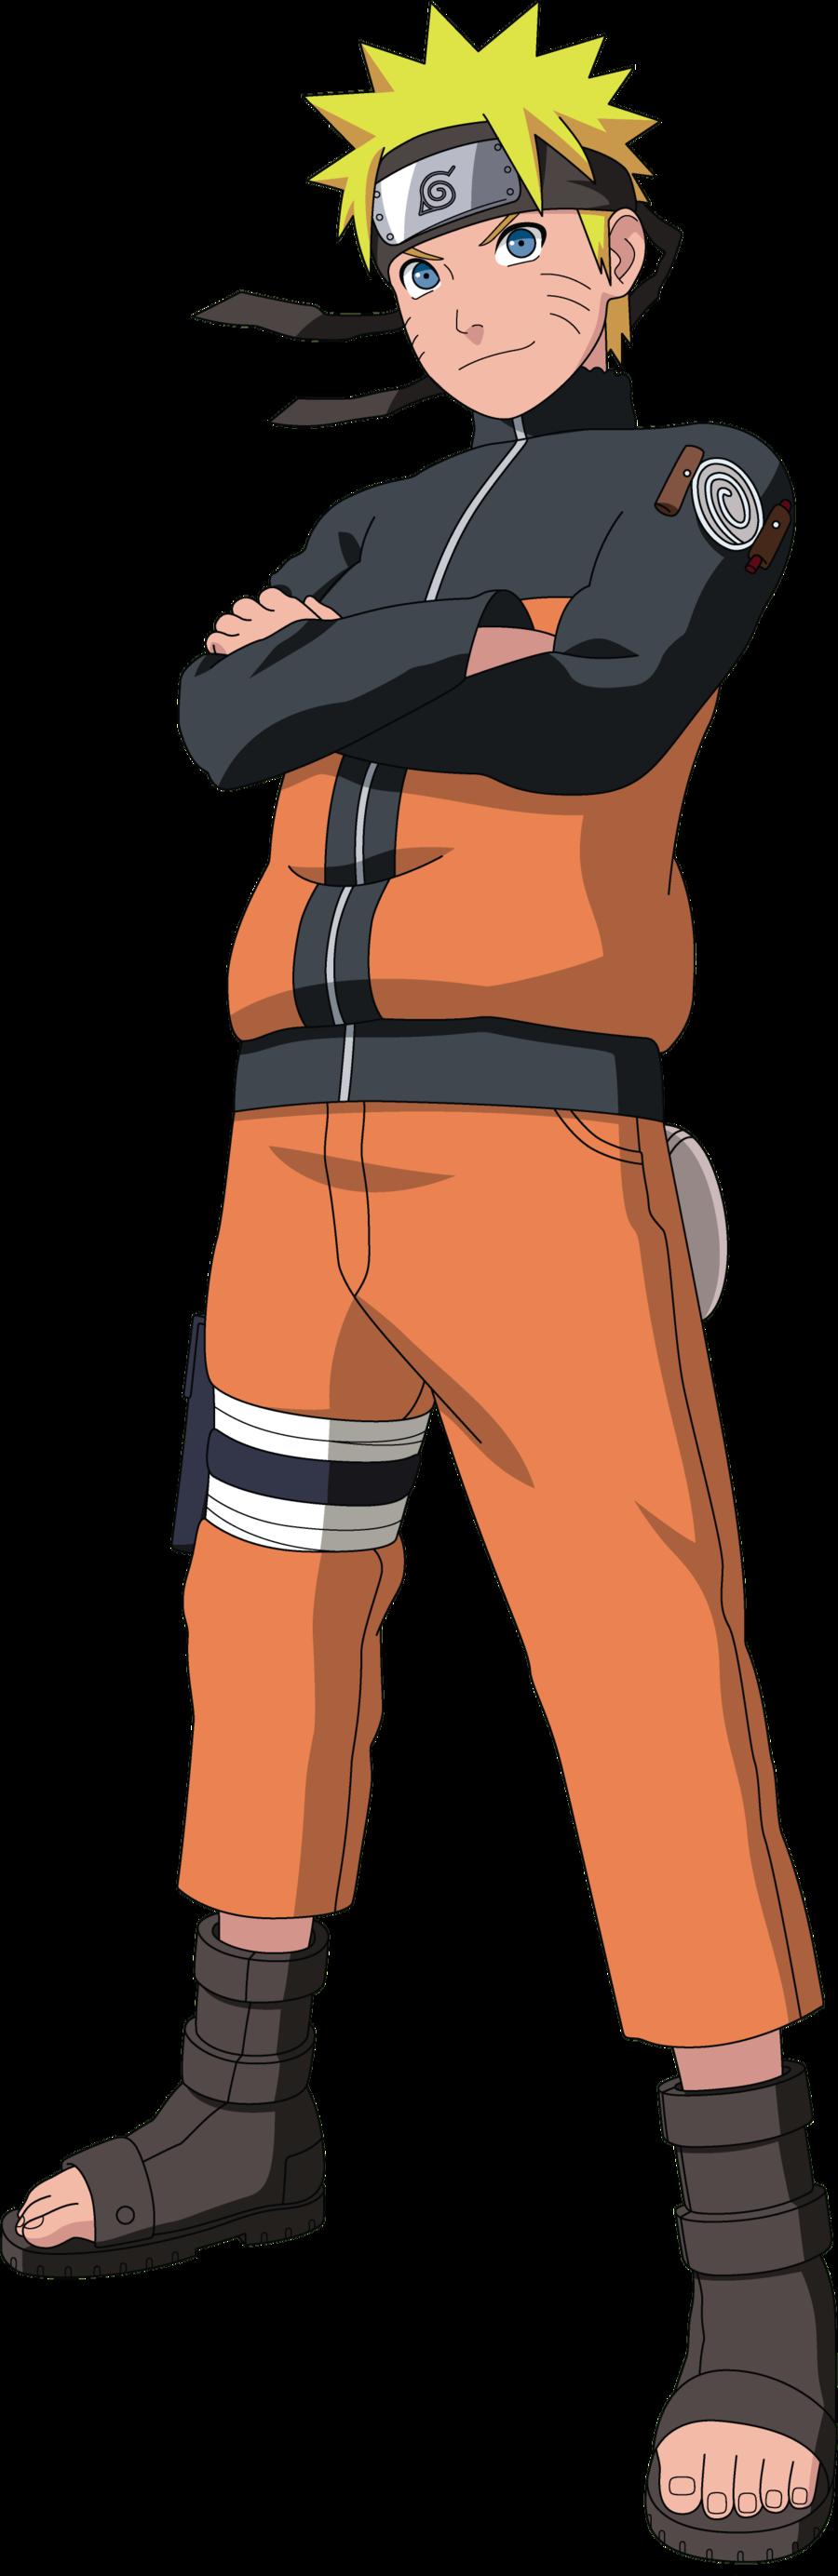 Naruto uzumaki fiction multiverse. Pin clipart wrestling pin